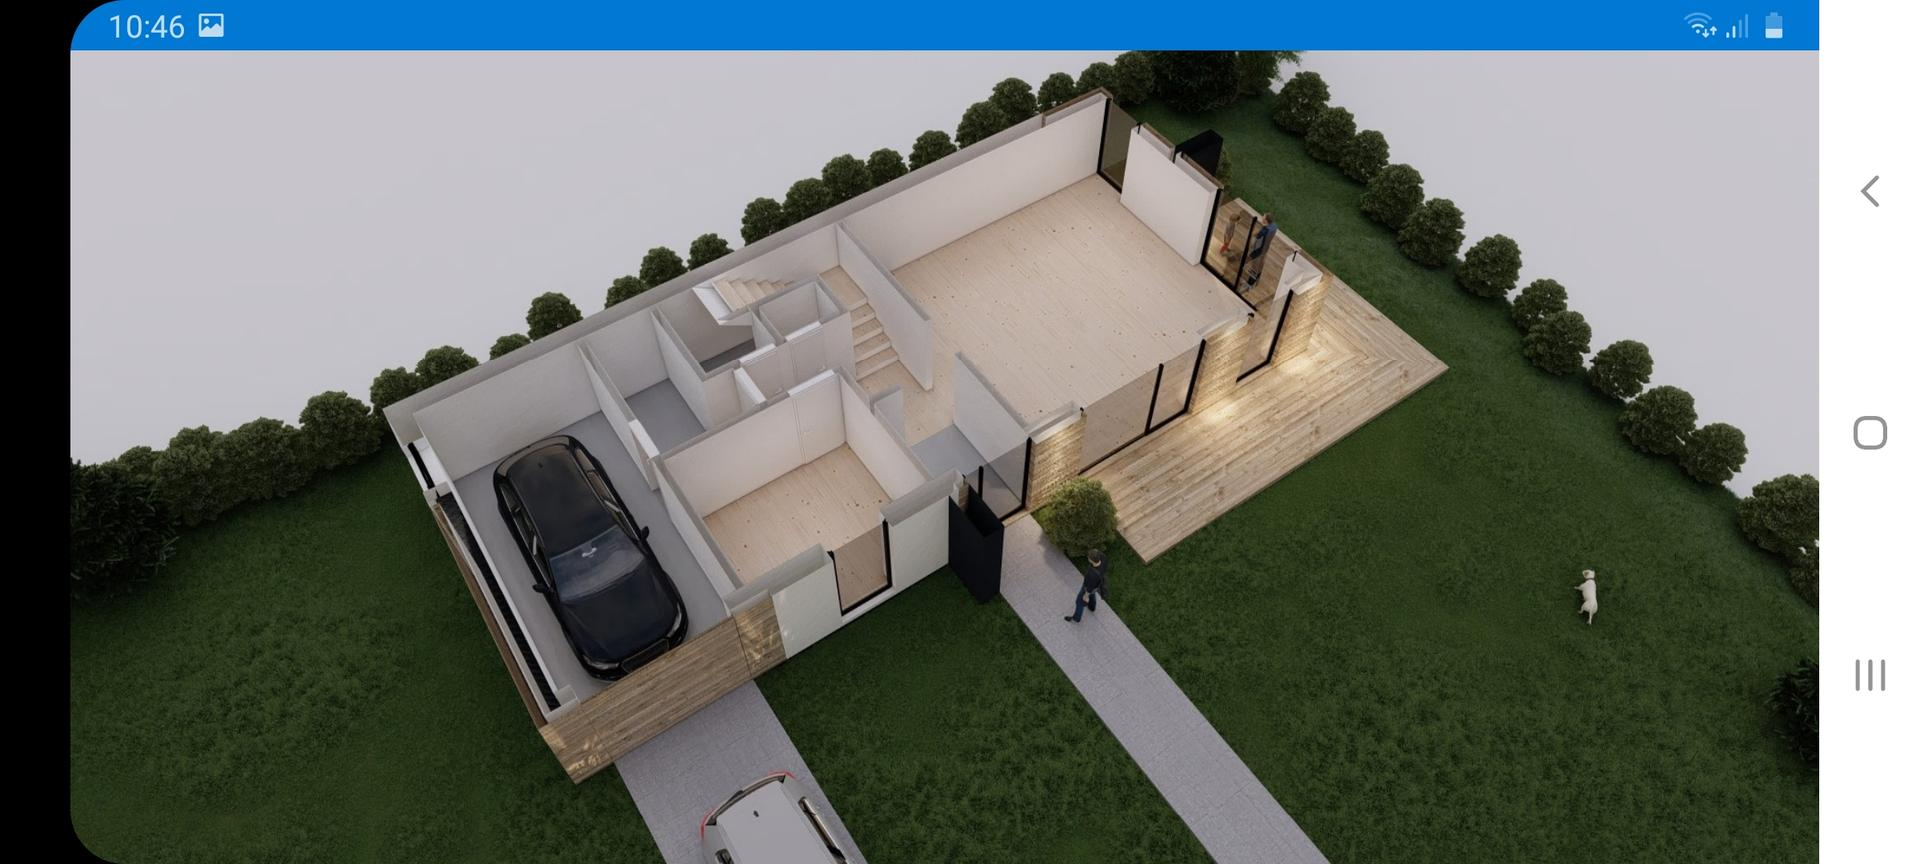 Náš budúci domček 🥰❤ - Obrázok č. 3